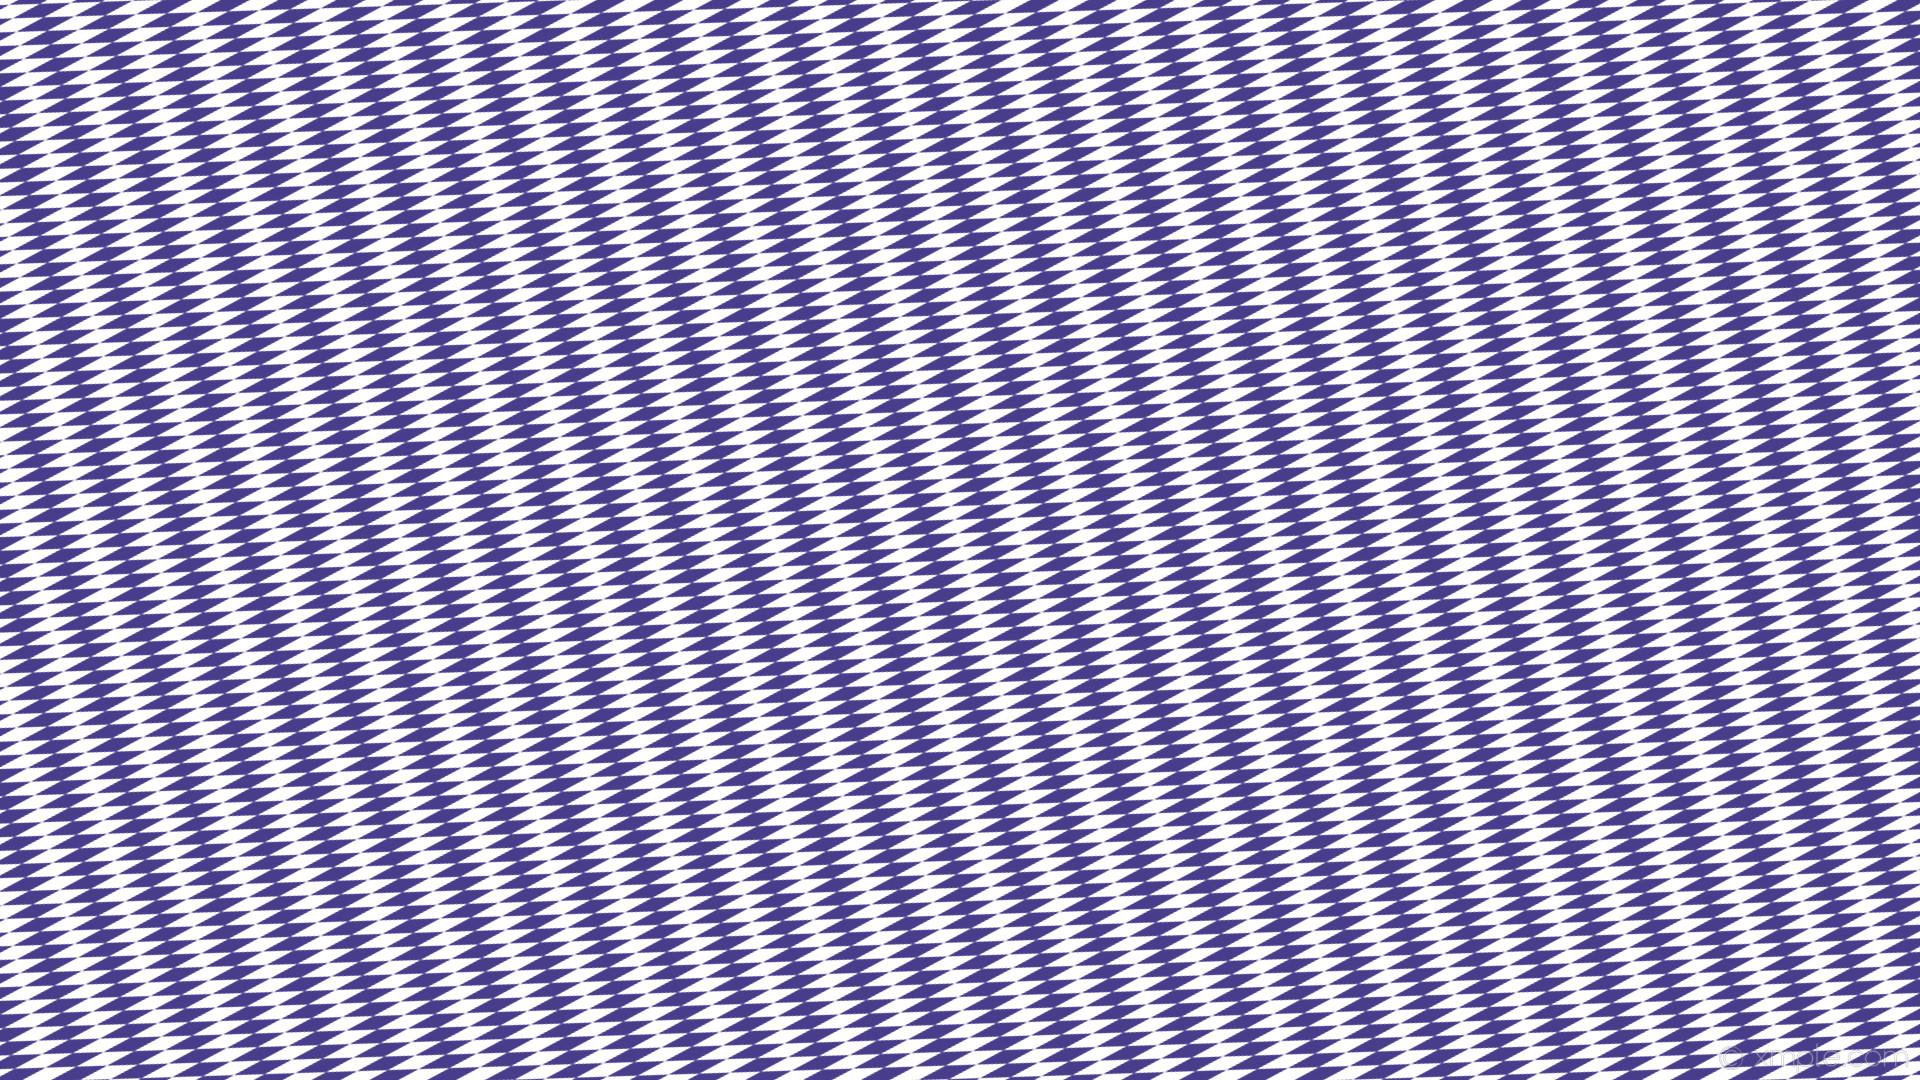 wallpaper rhombus purple diamond lozenge white dark slate blue #ffffff  #483d8b 15° 60px